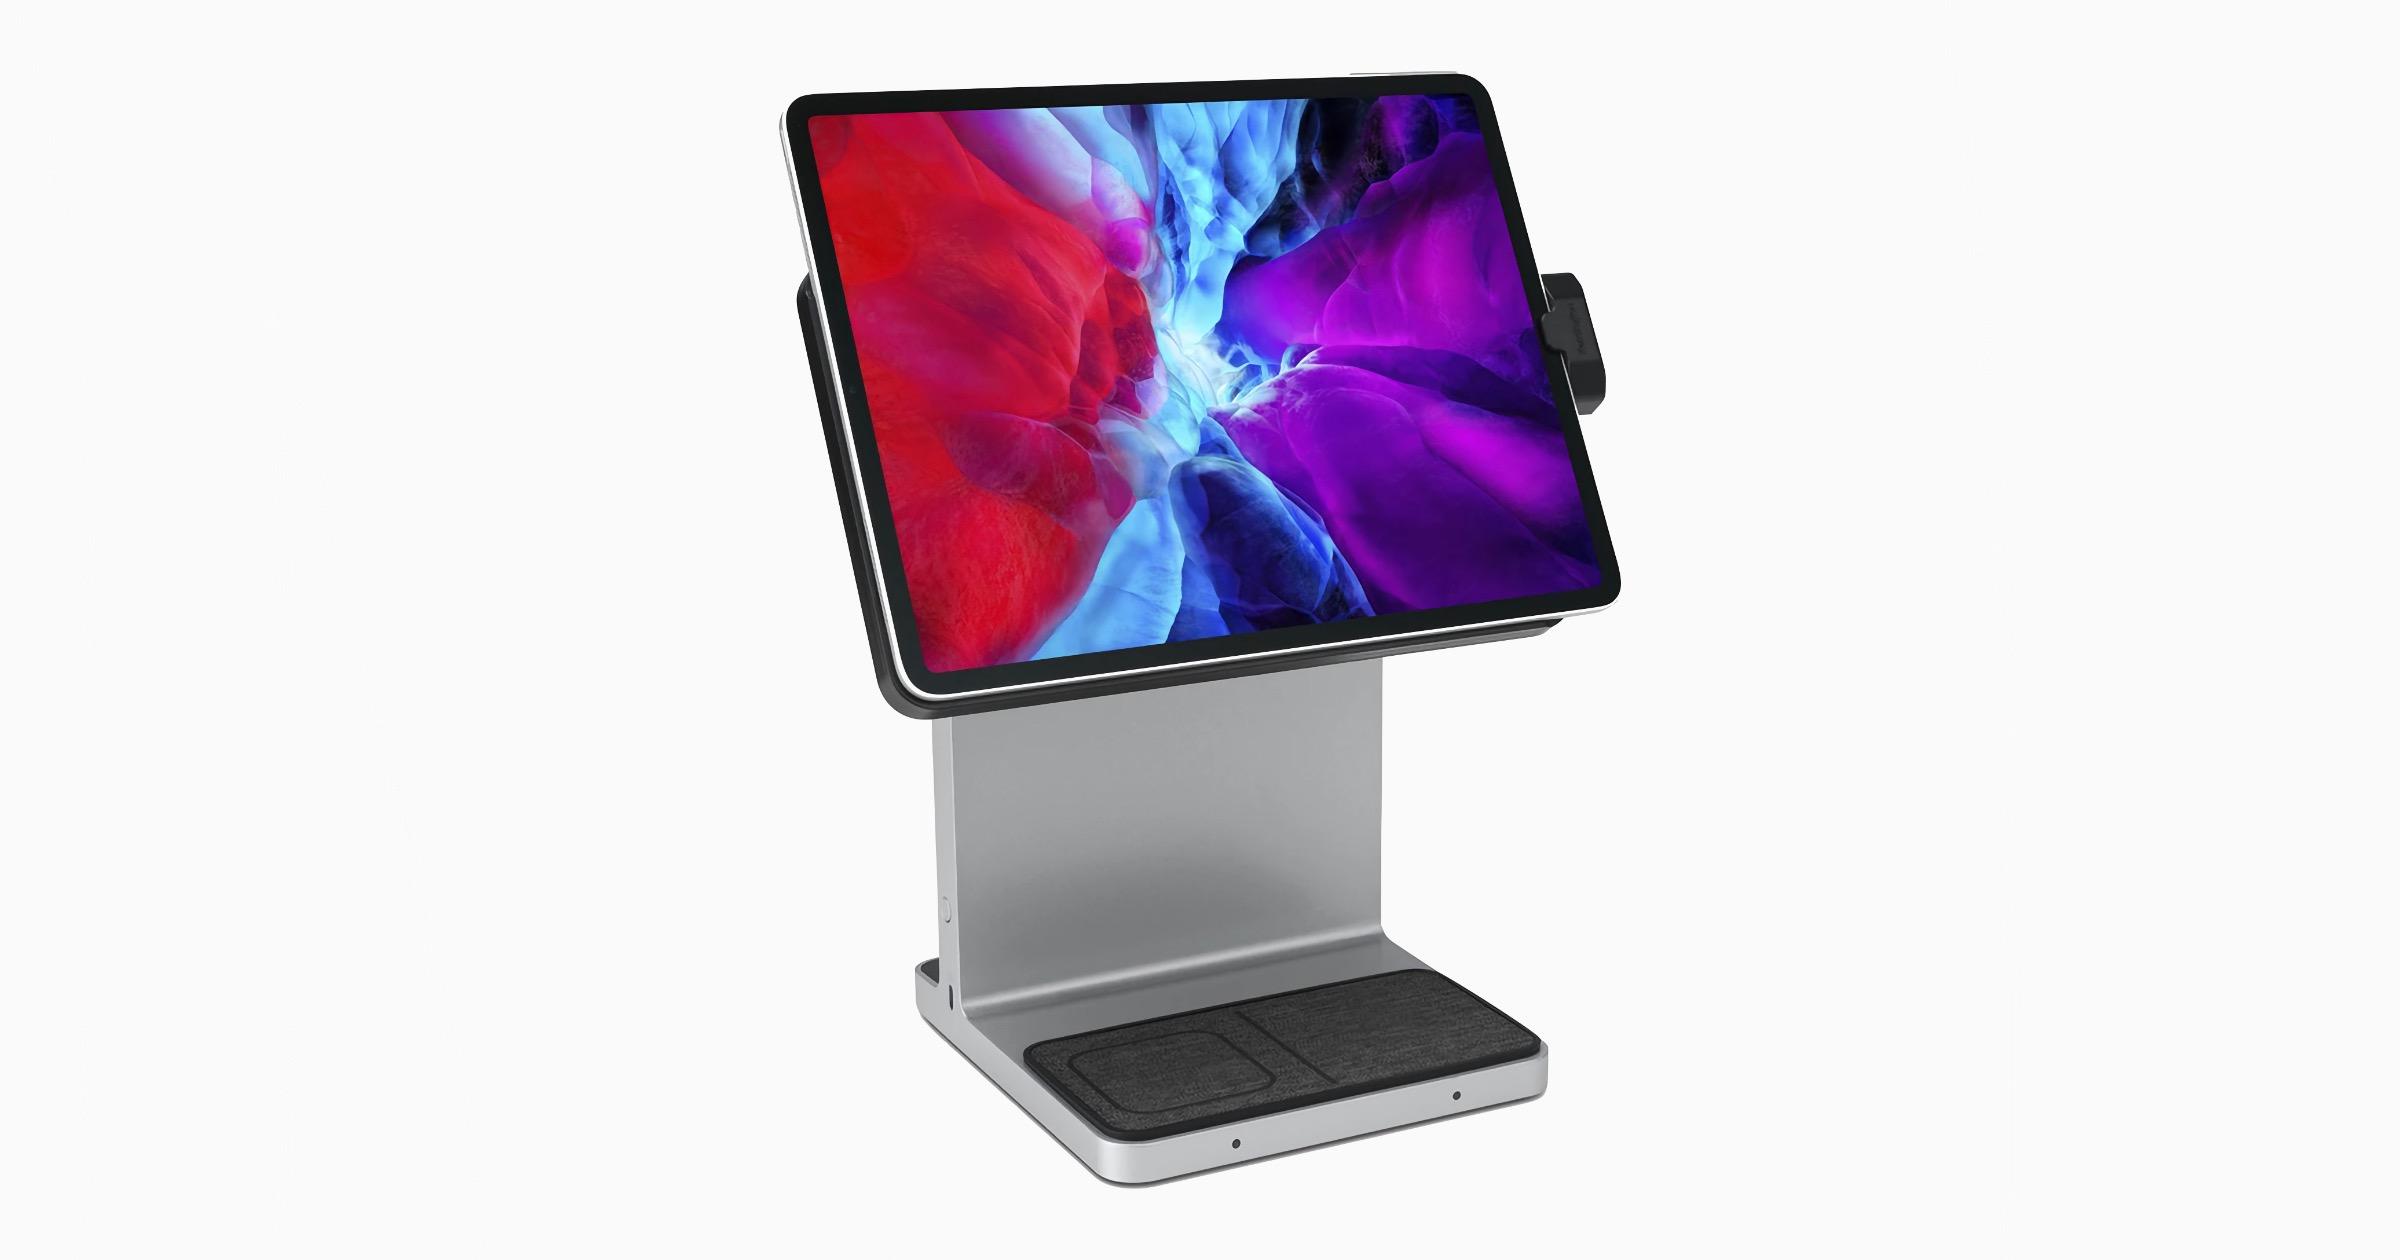 Kensington StudioDock iPad stand